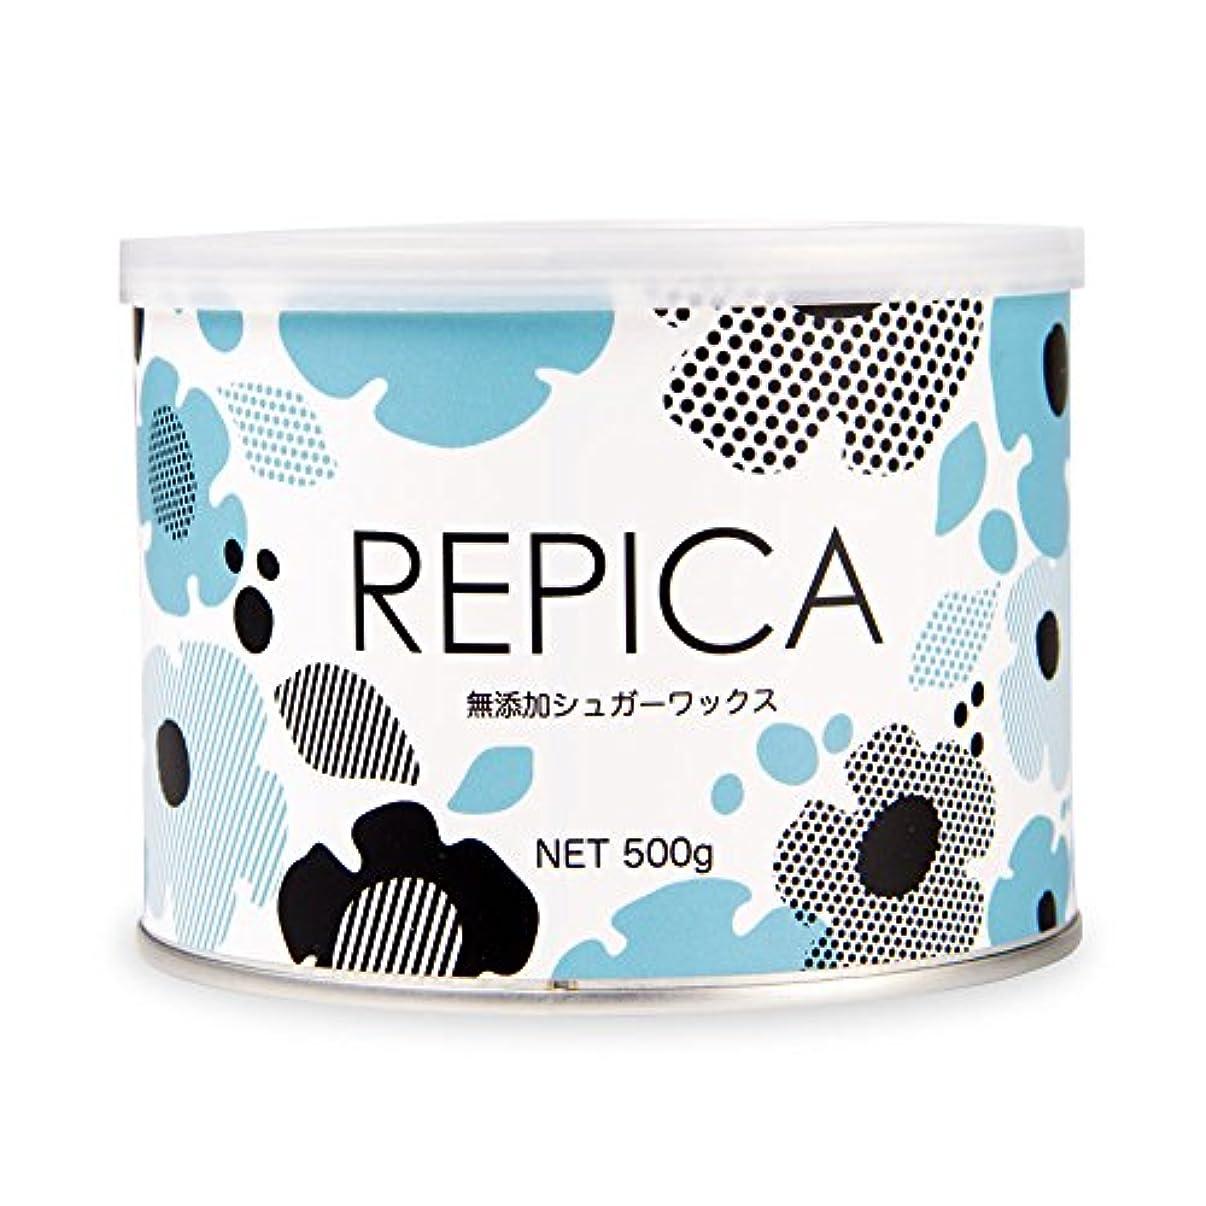 REPICA 無添加シュガーワックス 400ml ブラジリアンワックス脱毛 1個